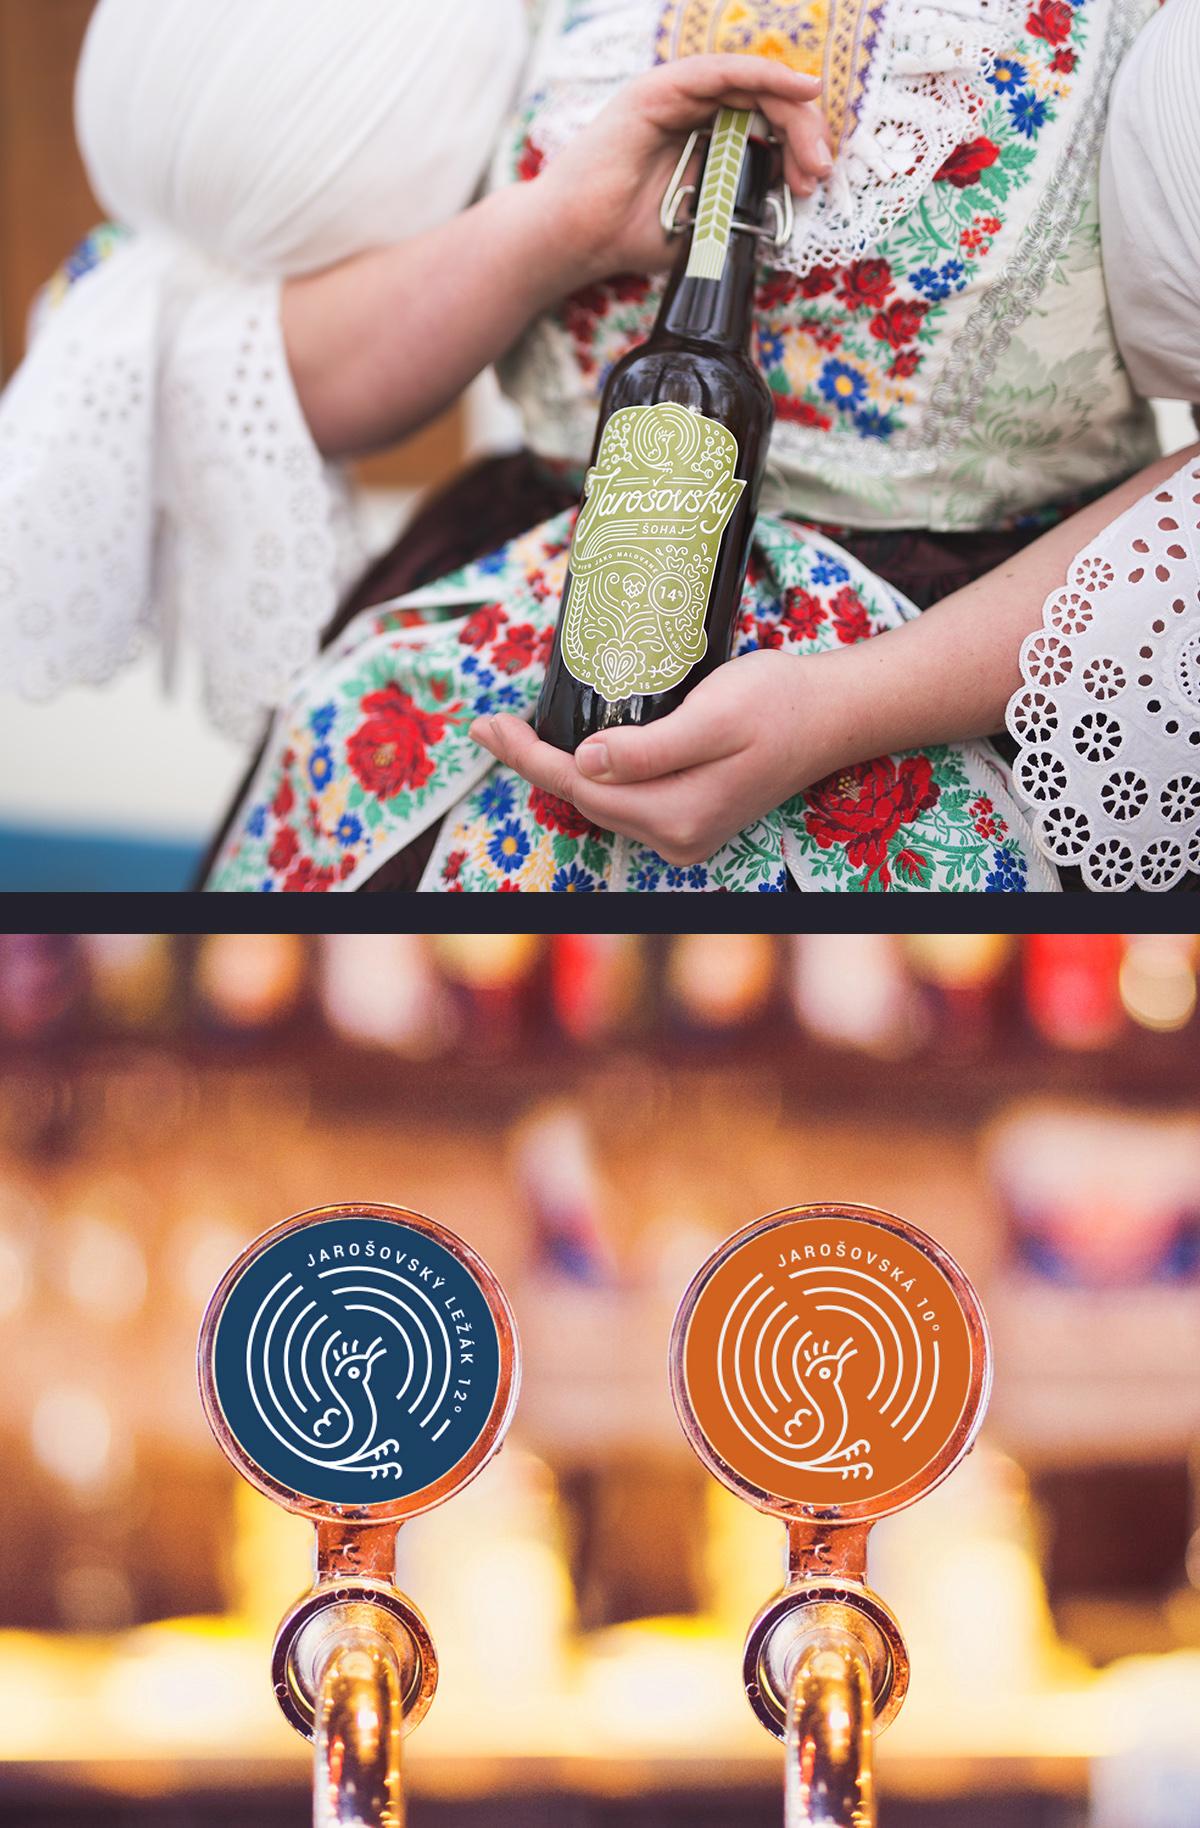 Jarosov Brewery — crafting a new visual identity. </br>World Beer Awards 2017 winner